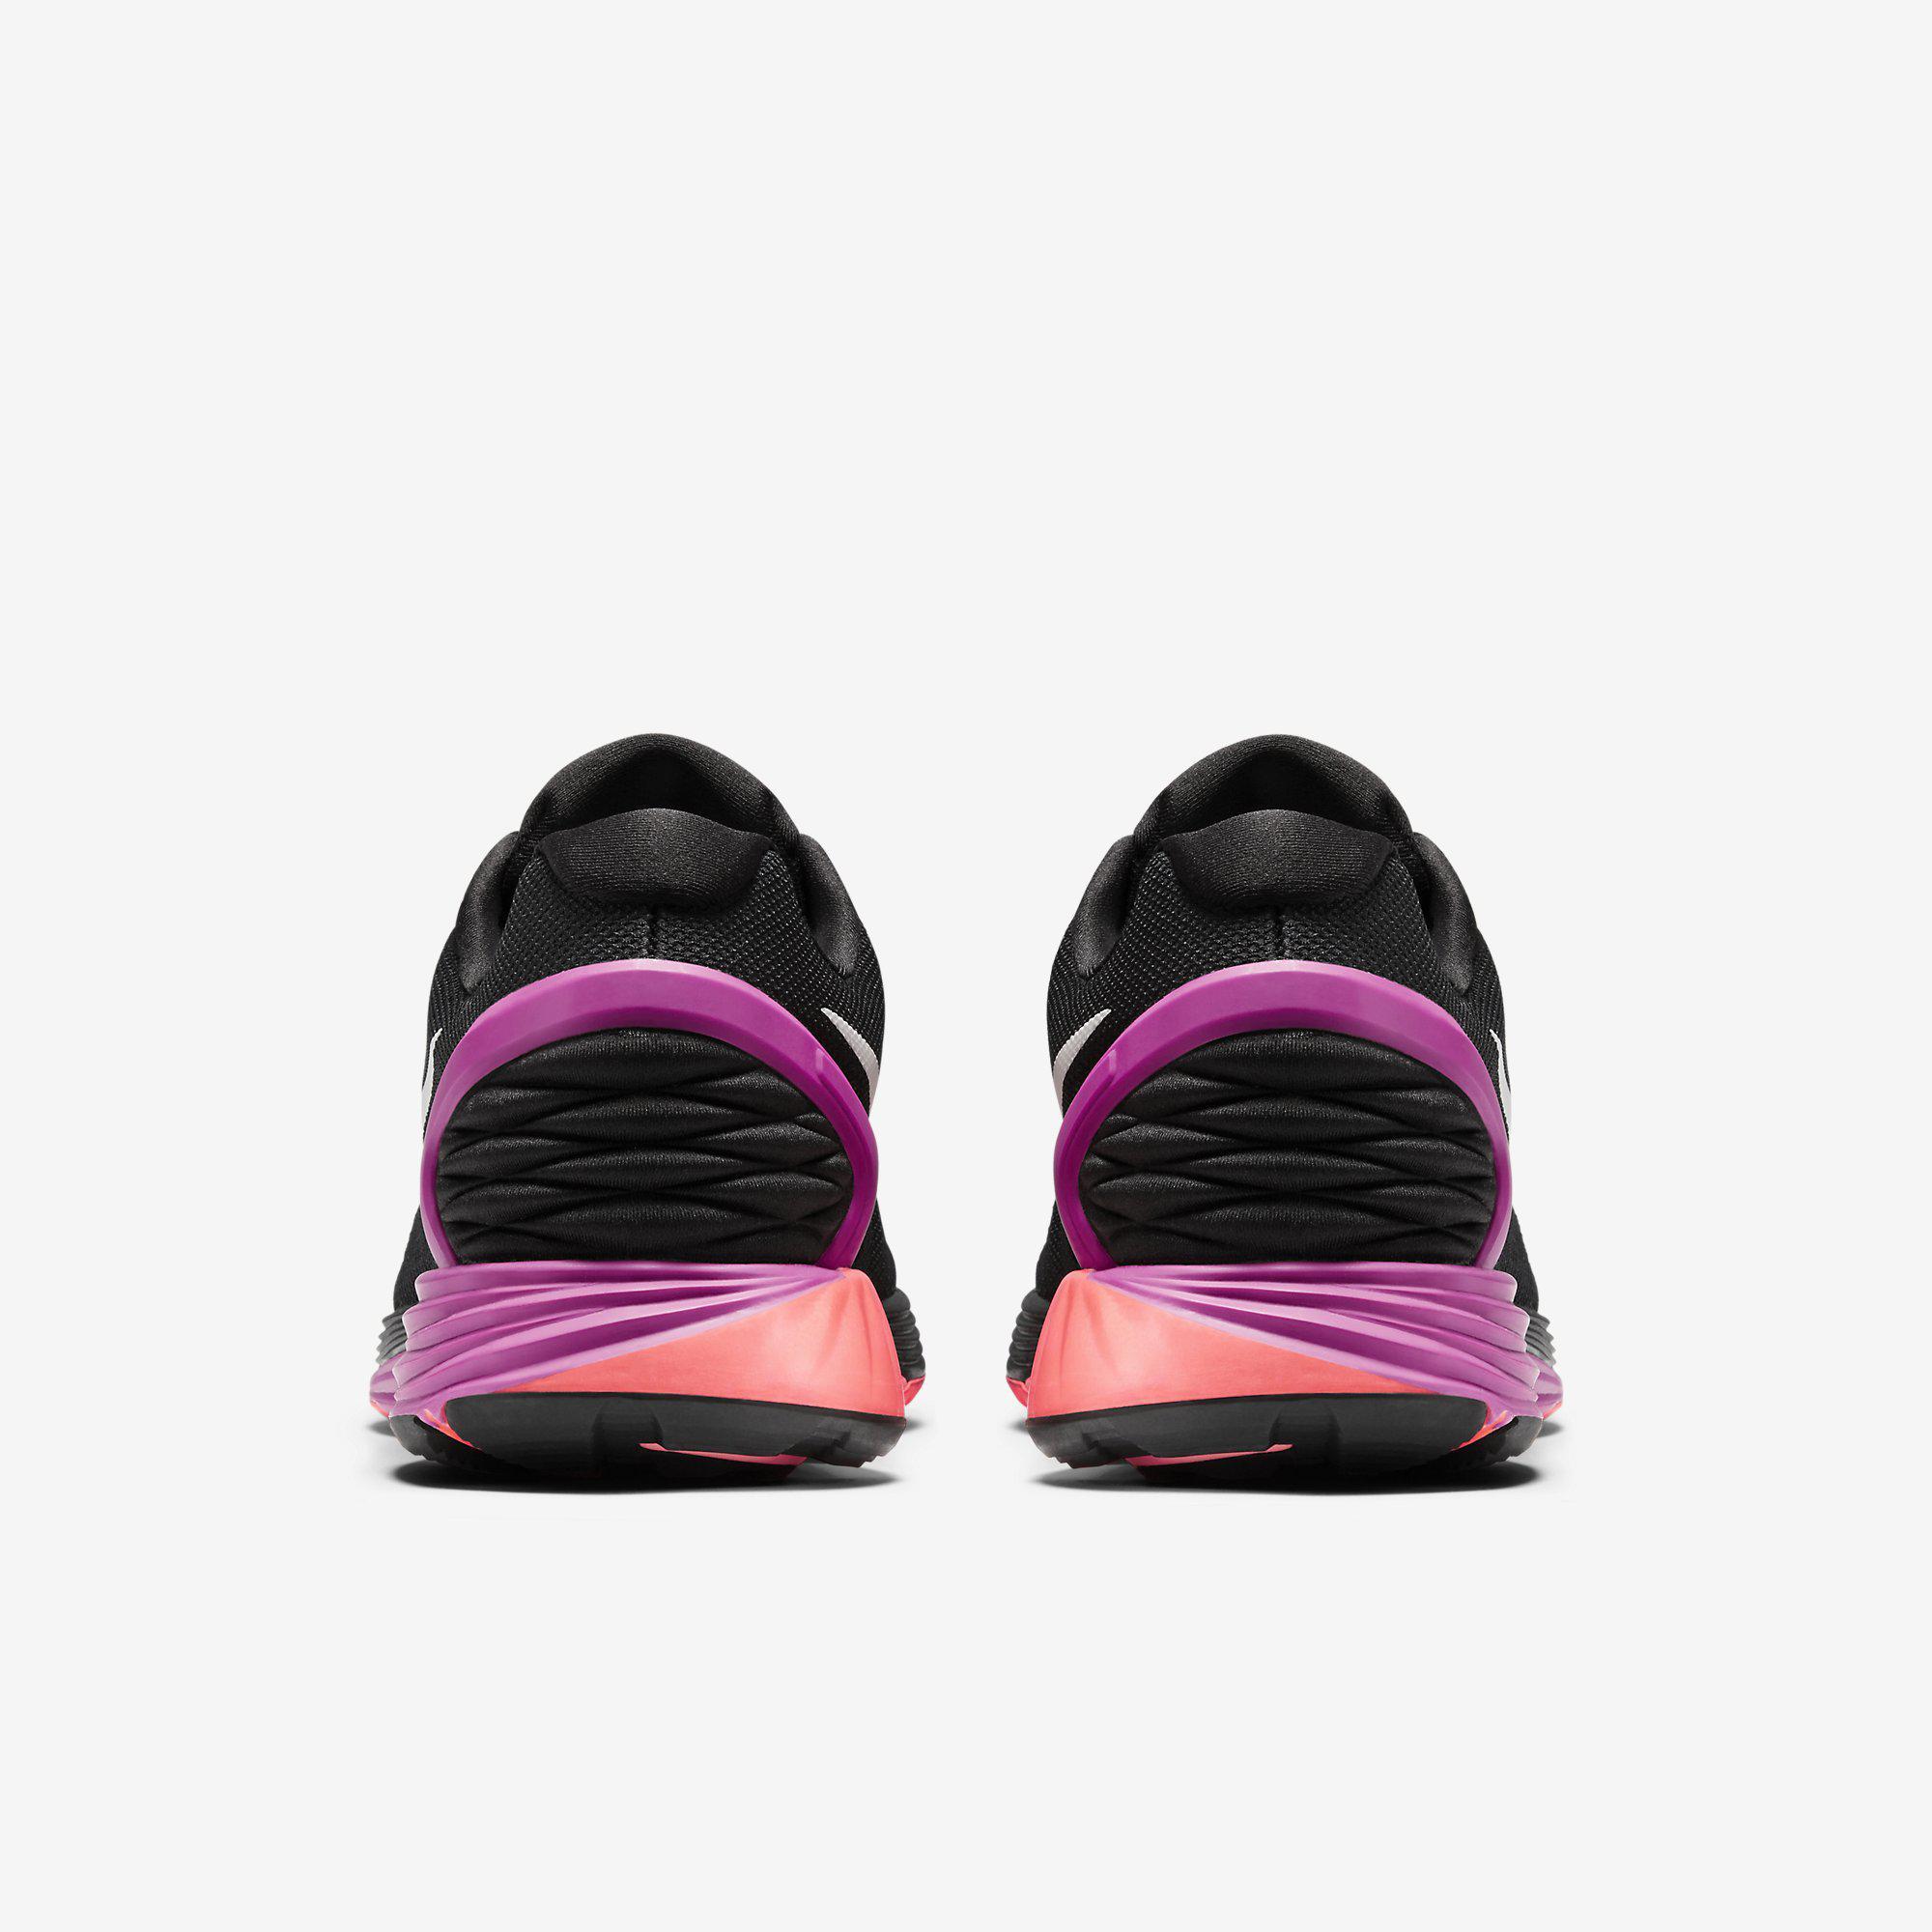 28fb923f00a6 ... wholesale nike womens lunarglide 6 running shoes black fuchsia flash  c2152 254ea